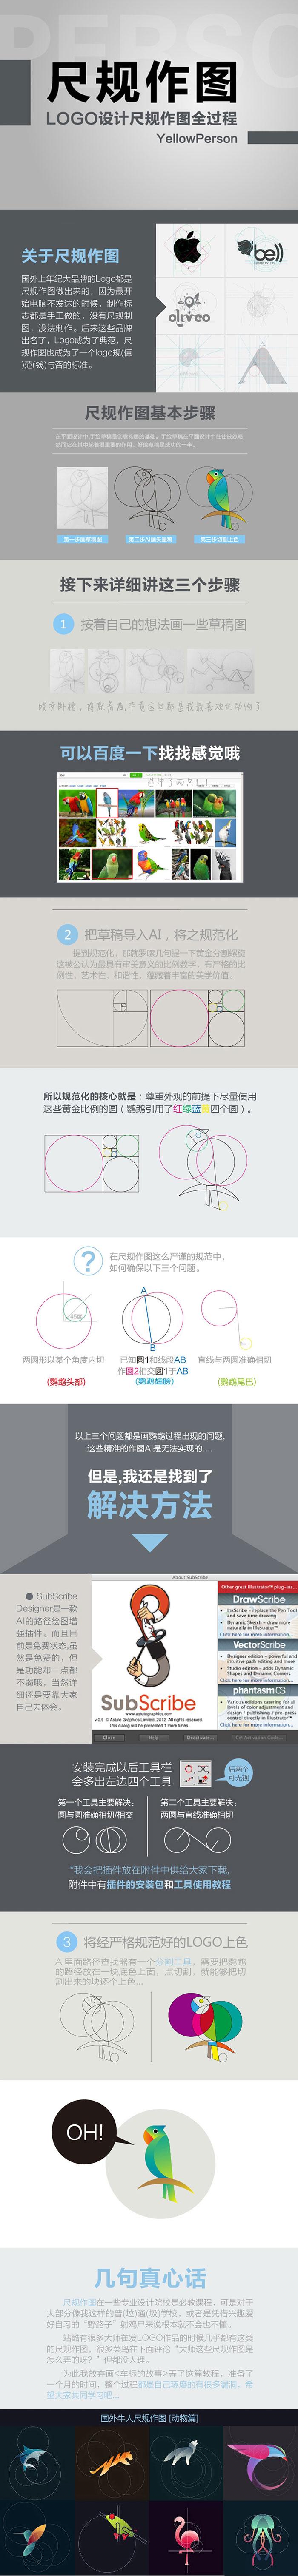 logo设计之尺规作图